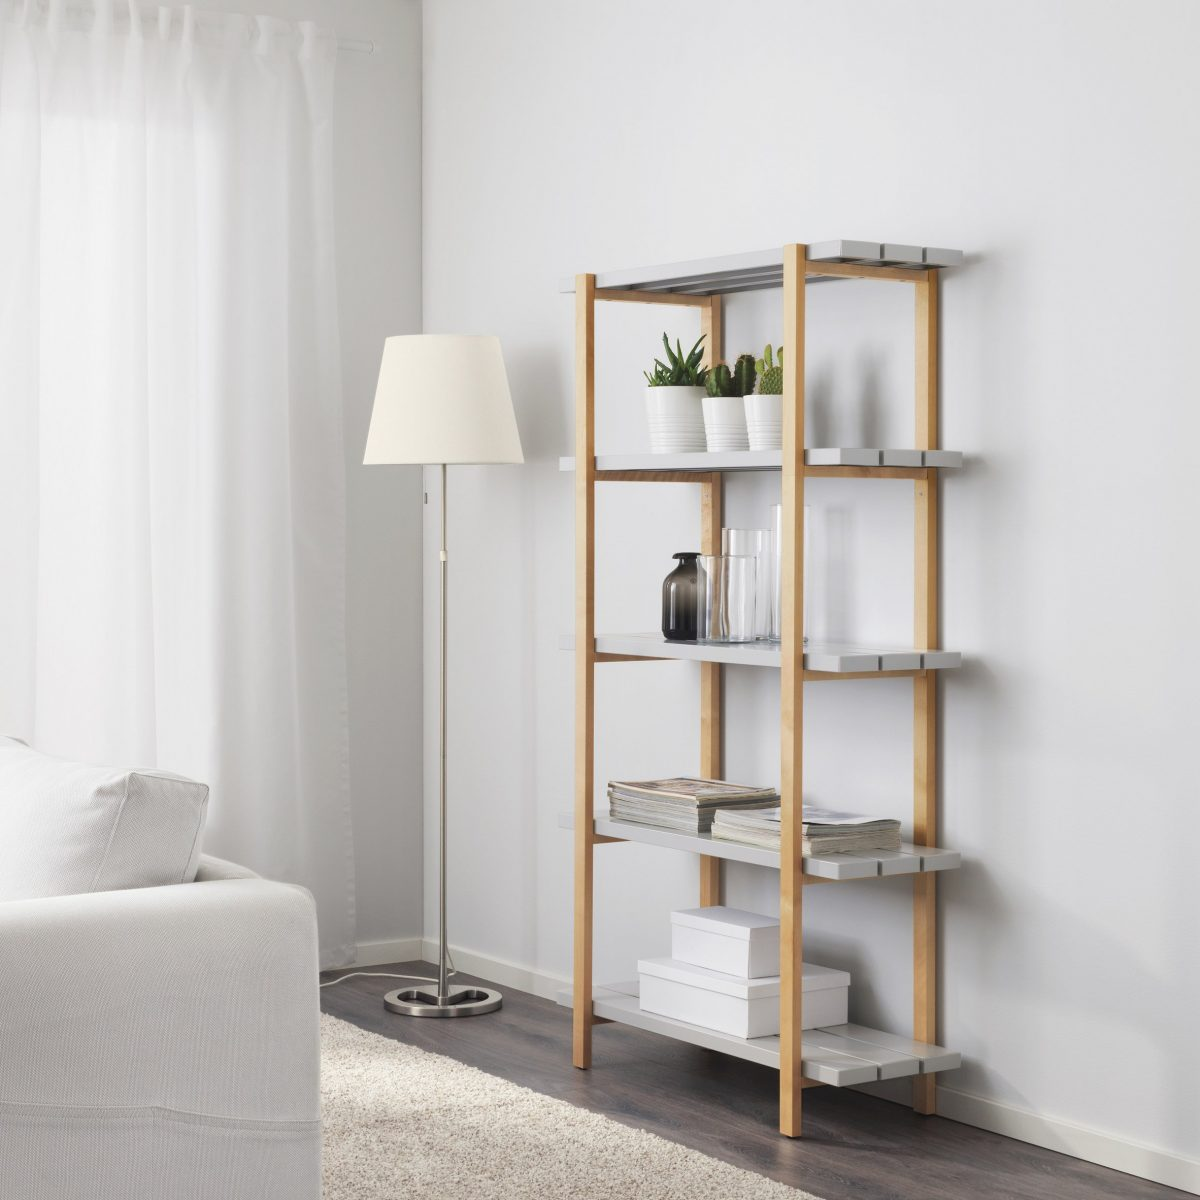 IKEA Ypperlig i samarbete med HAY